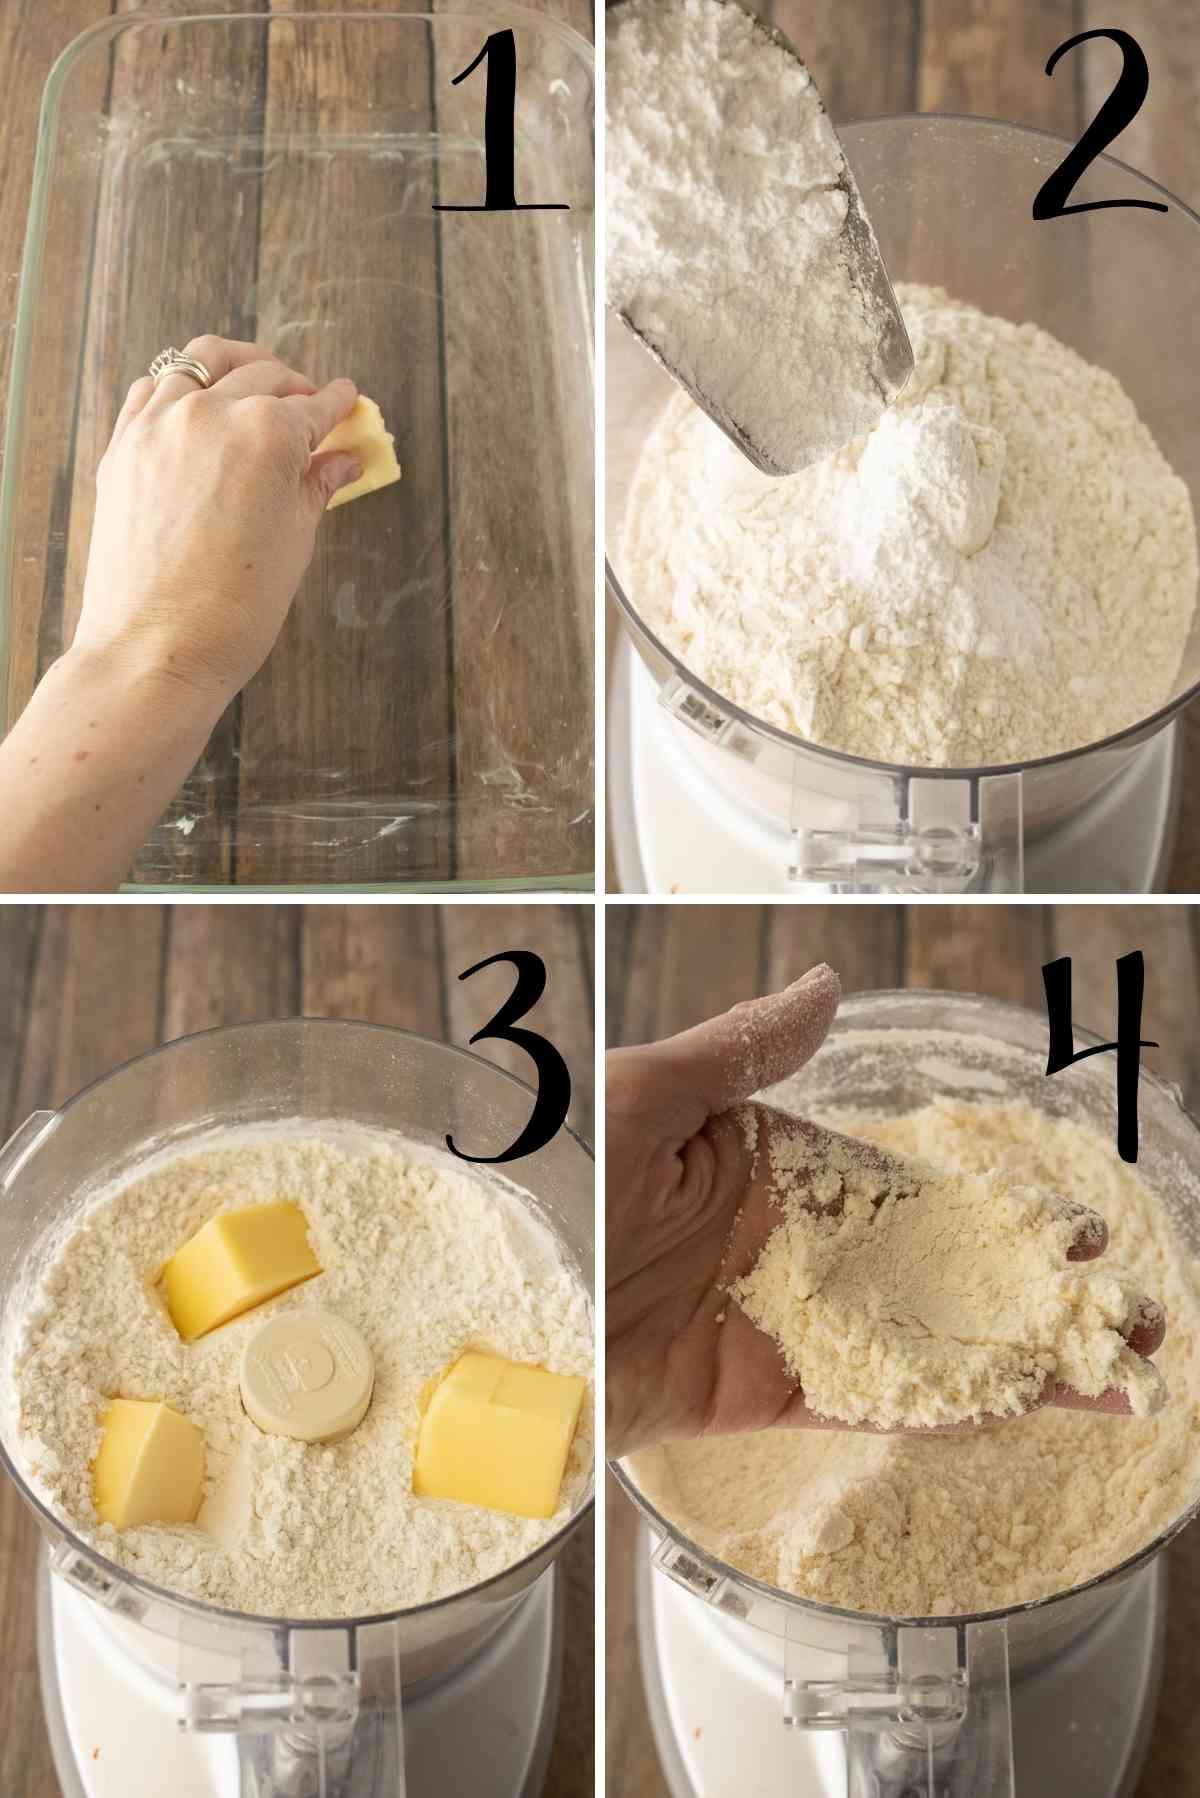 Butter baking dish and prepare shortbread crust.